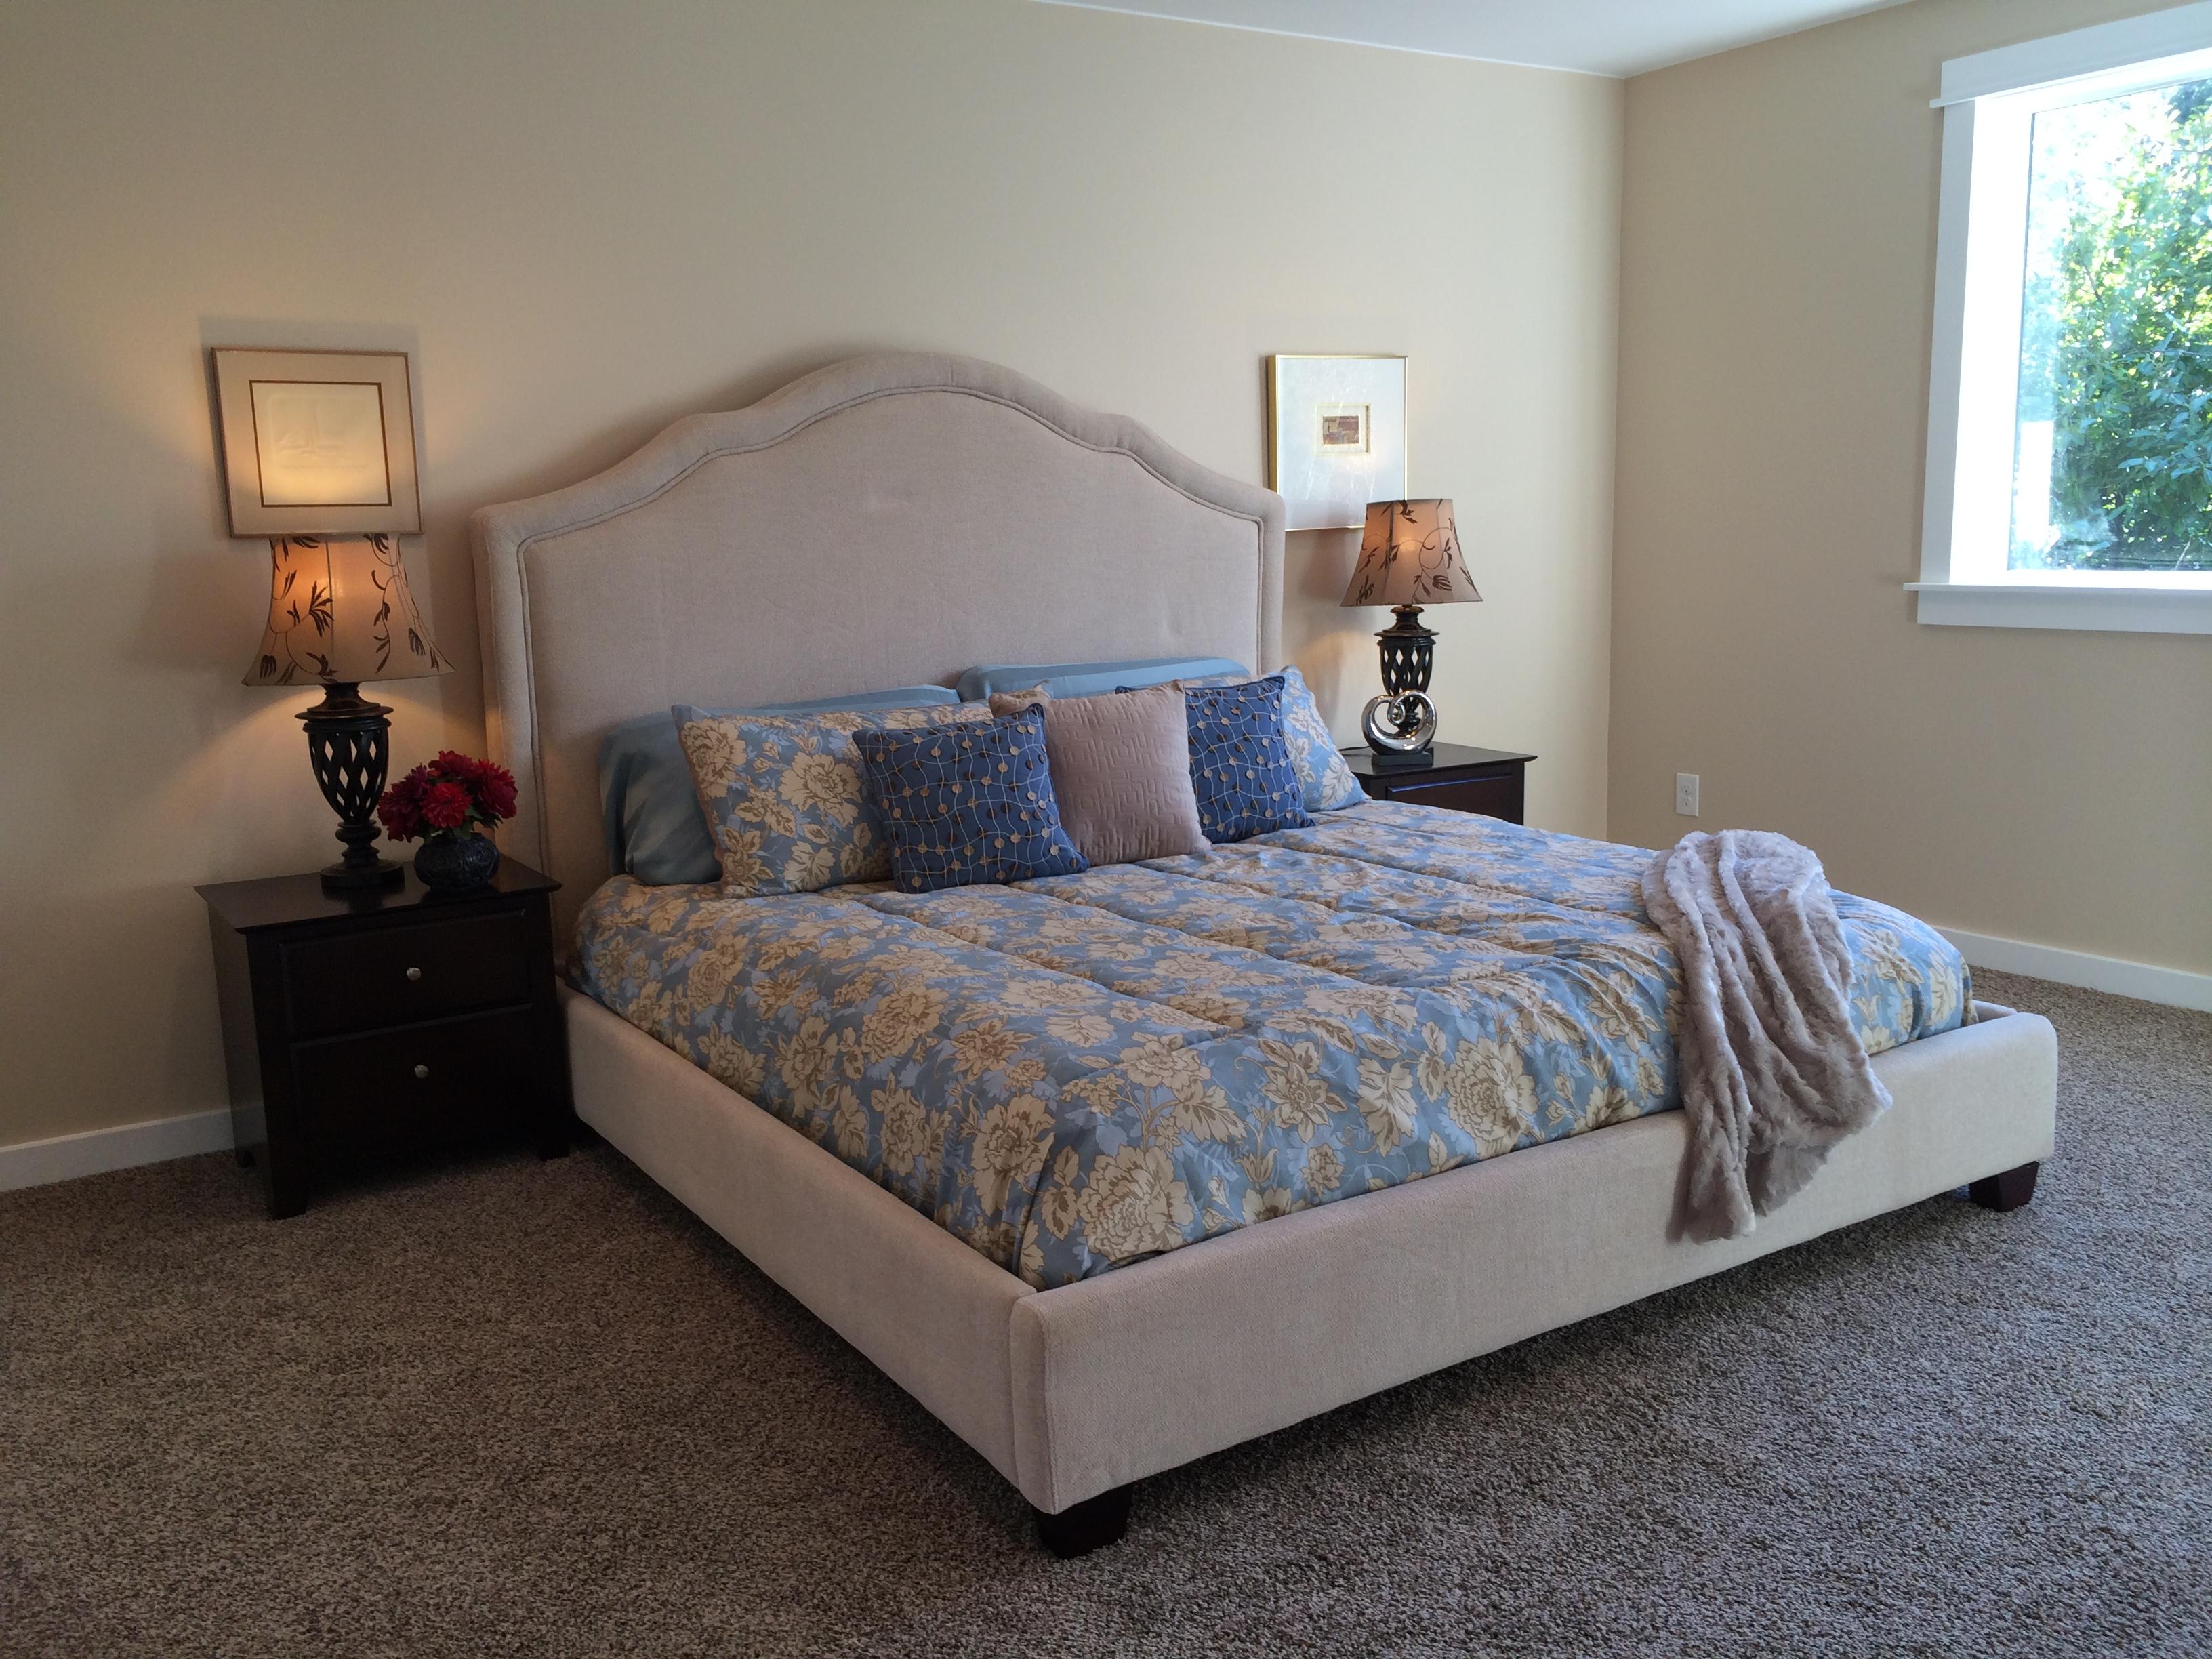 Emerald Home Furnishings Lilian Bed